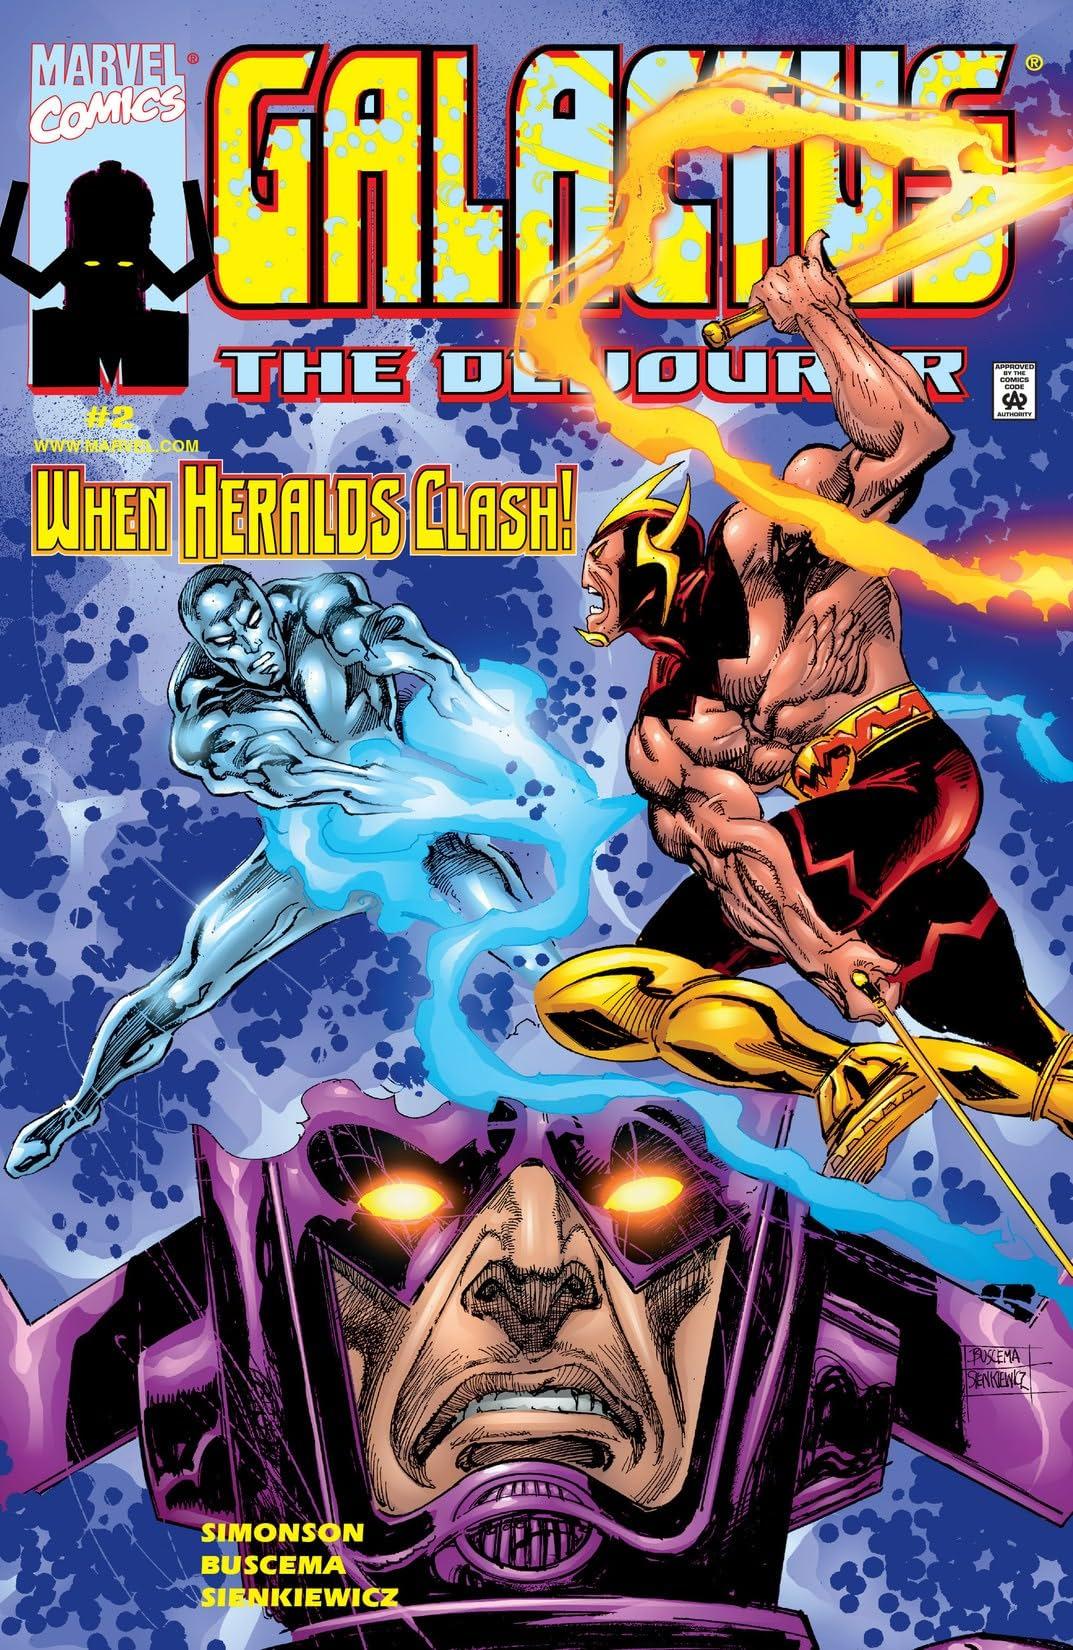 Galactus The Devourer (1999) #2 (of 6)